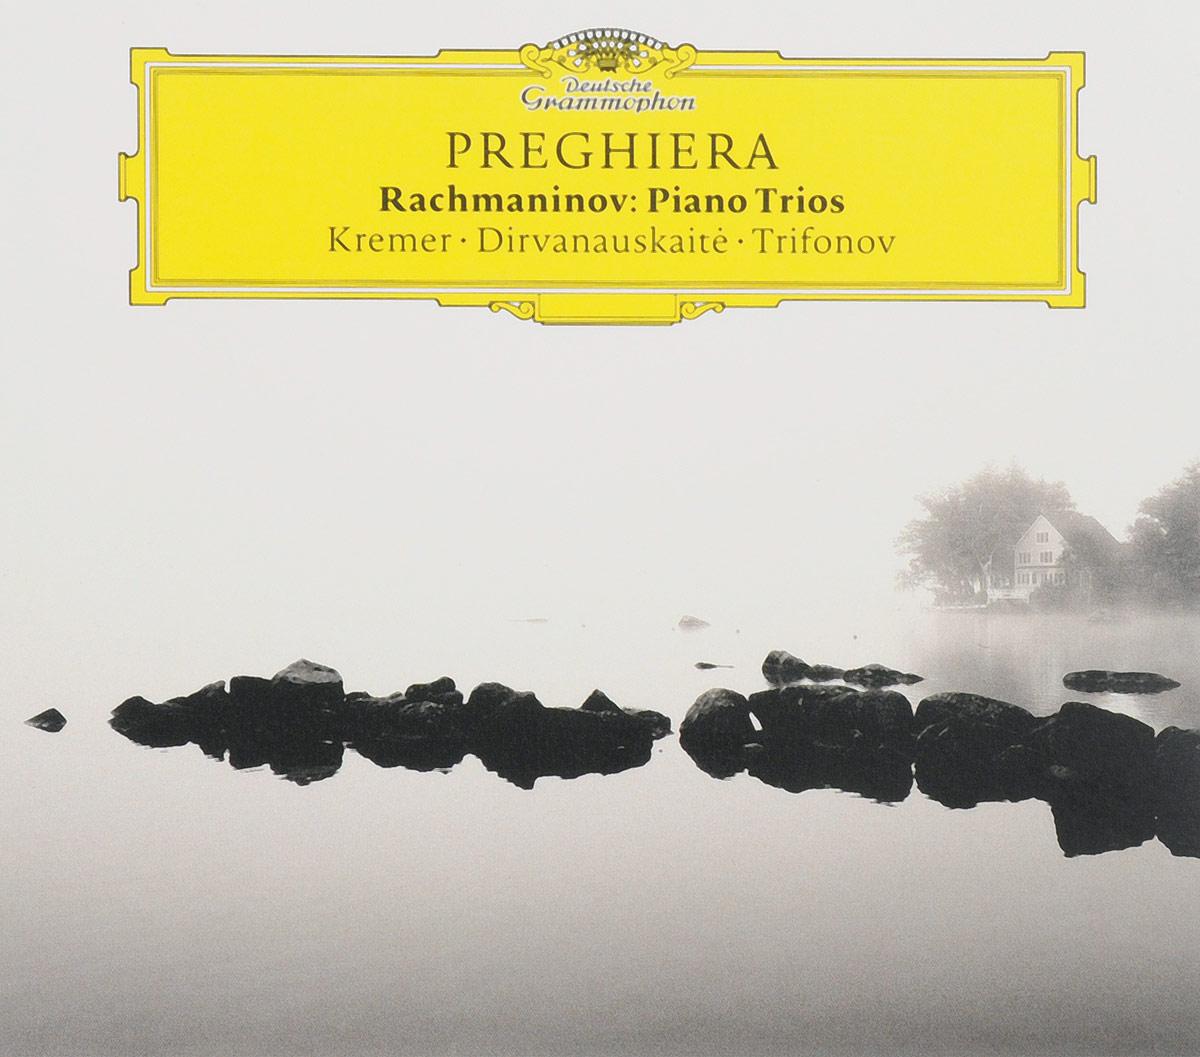 Kremer. Dirvanauskaite. Trifonov. Preghiera. Rachmaninov. Piano Trios